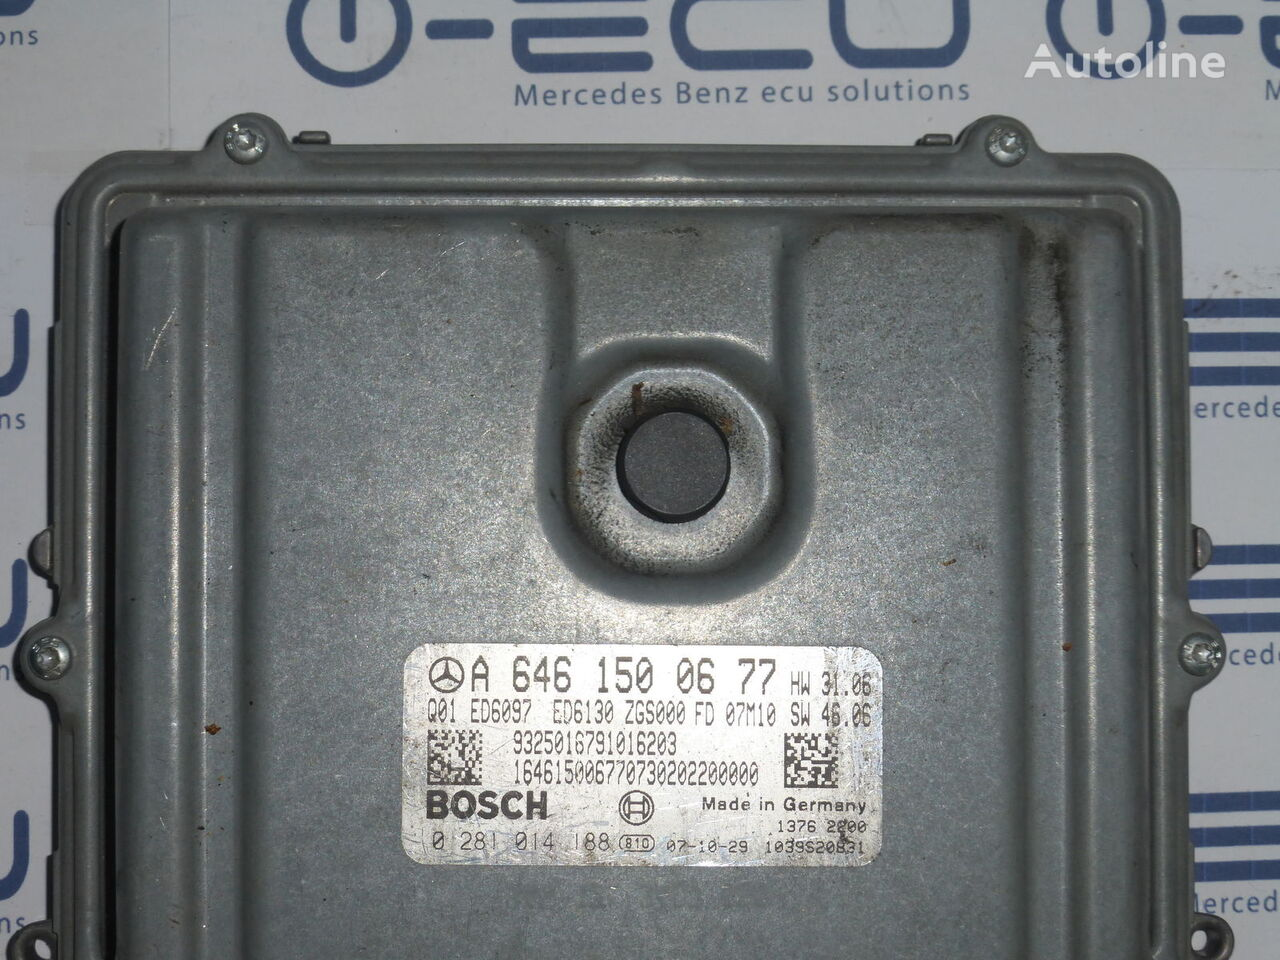 BOSCH A6461500677 control unit for MERCEDES-BENZ VITO 639 automobile